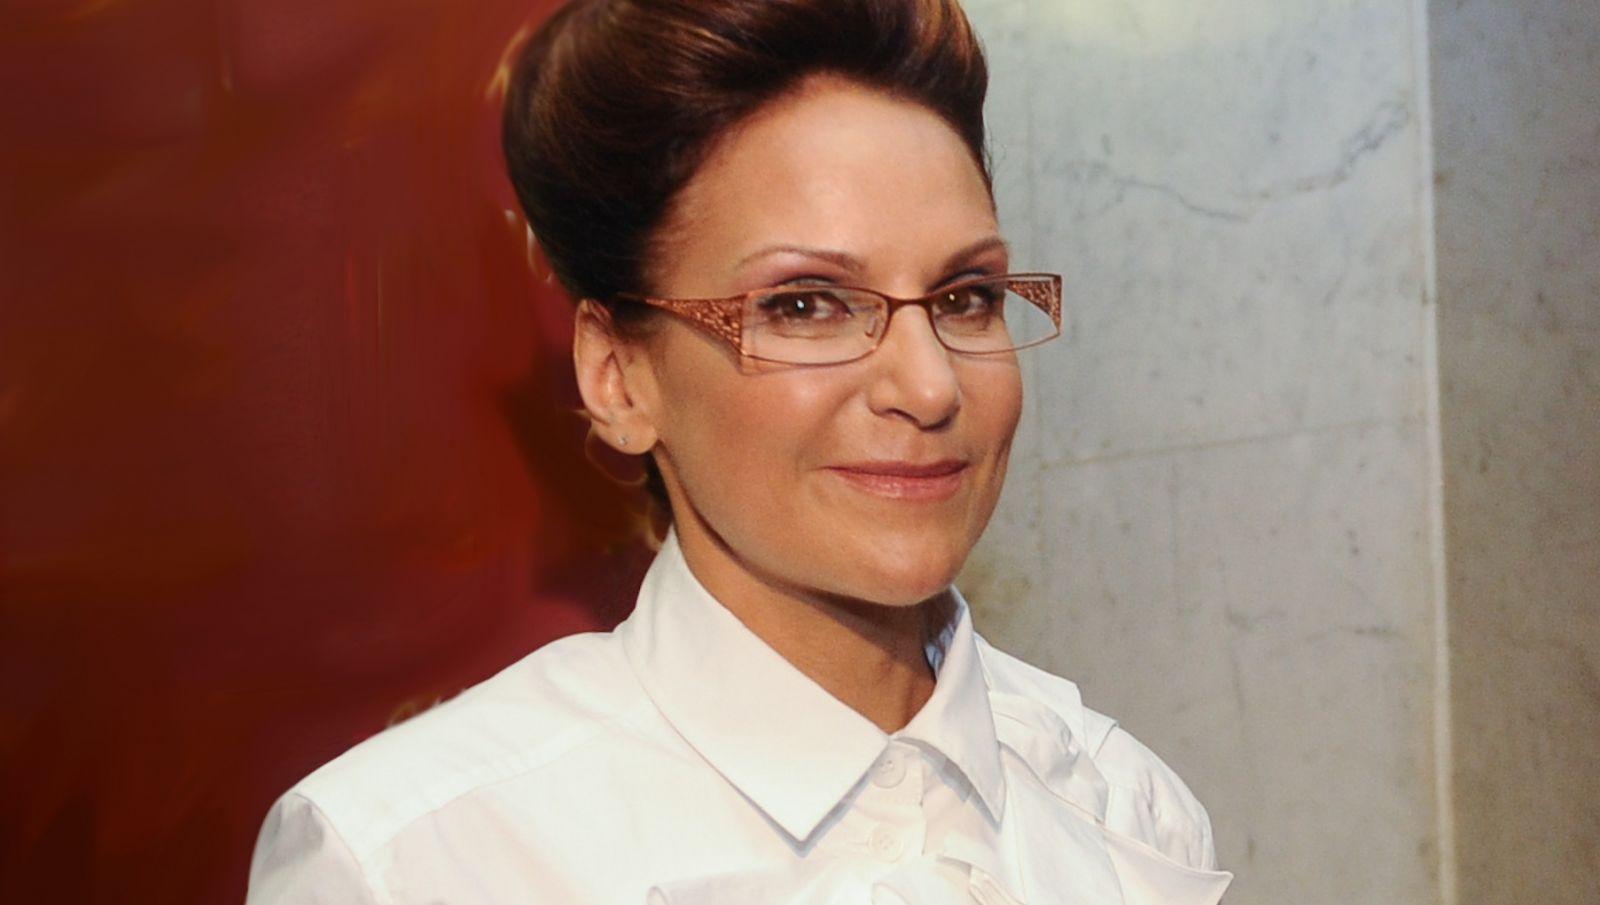 Людмила Артемьева - фото №1